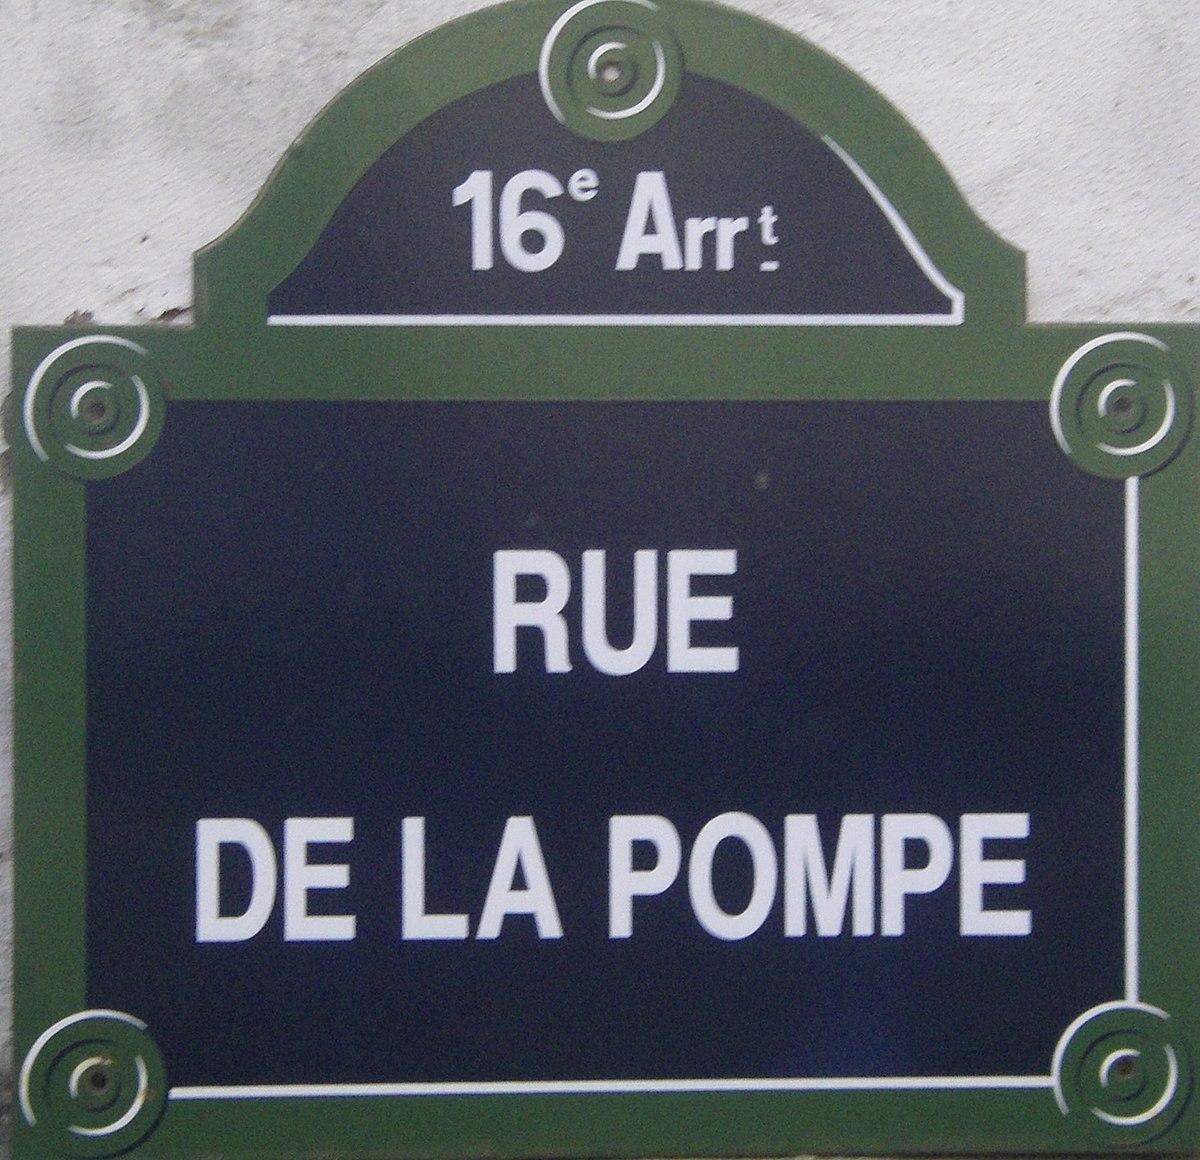 Rue De La Pompe  U2013 Wikipedia